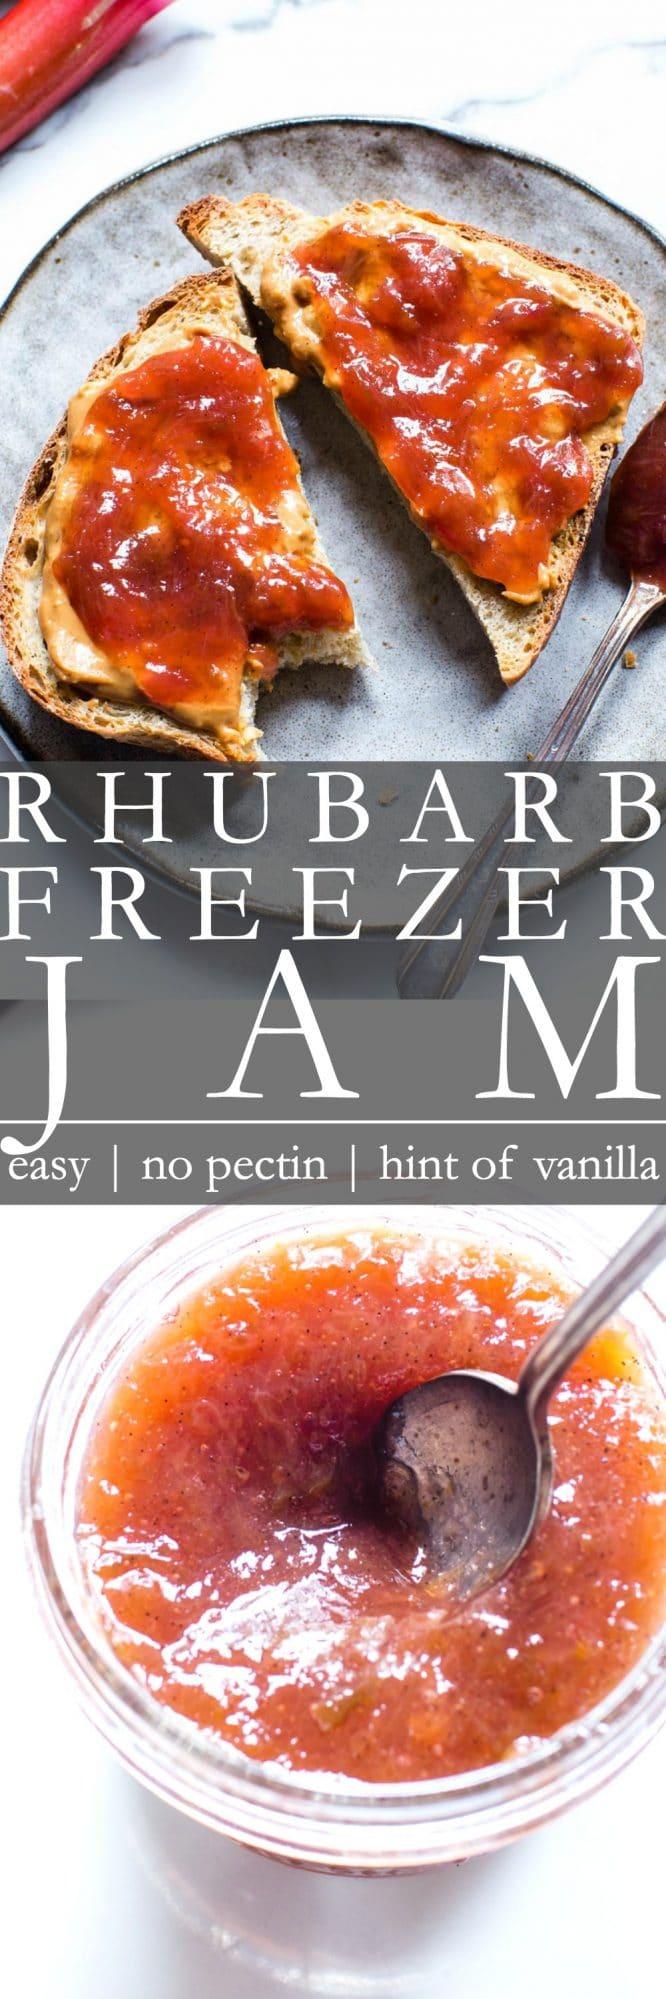 Rhubarb Freezer Jam Pinterest Pin